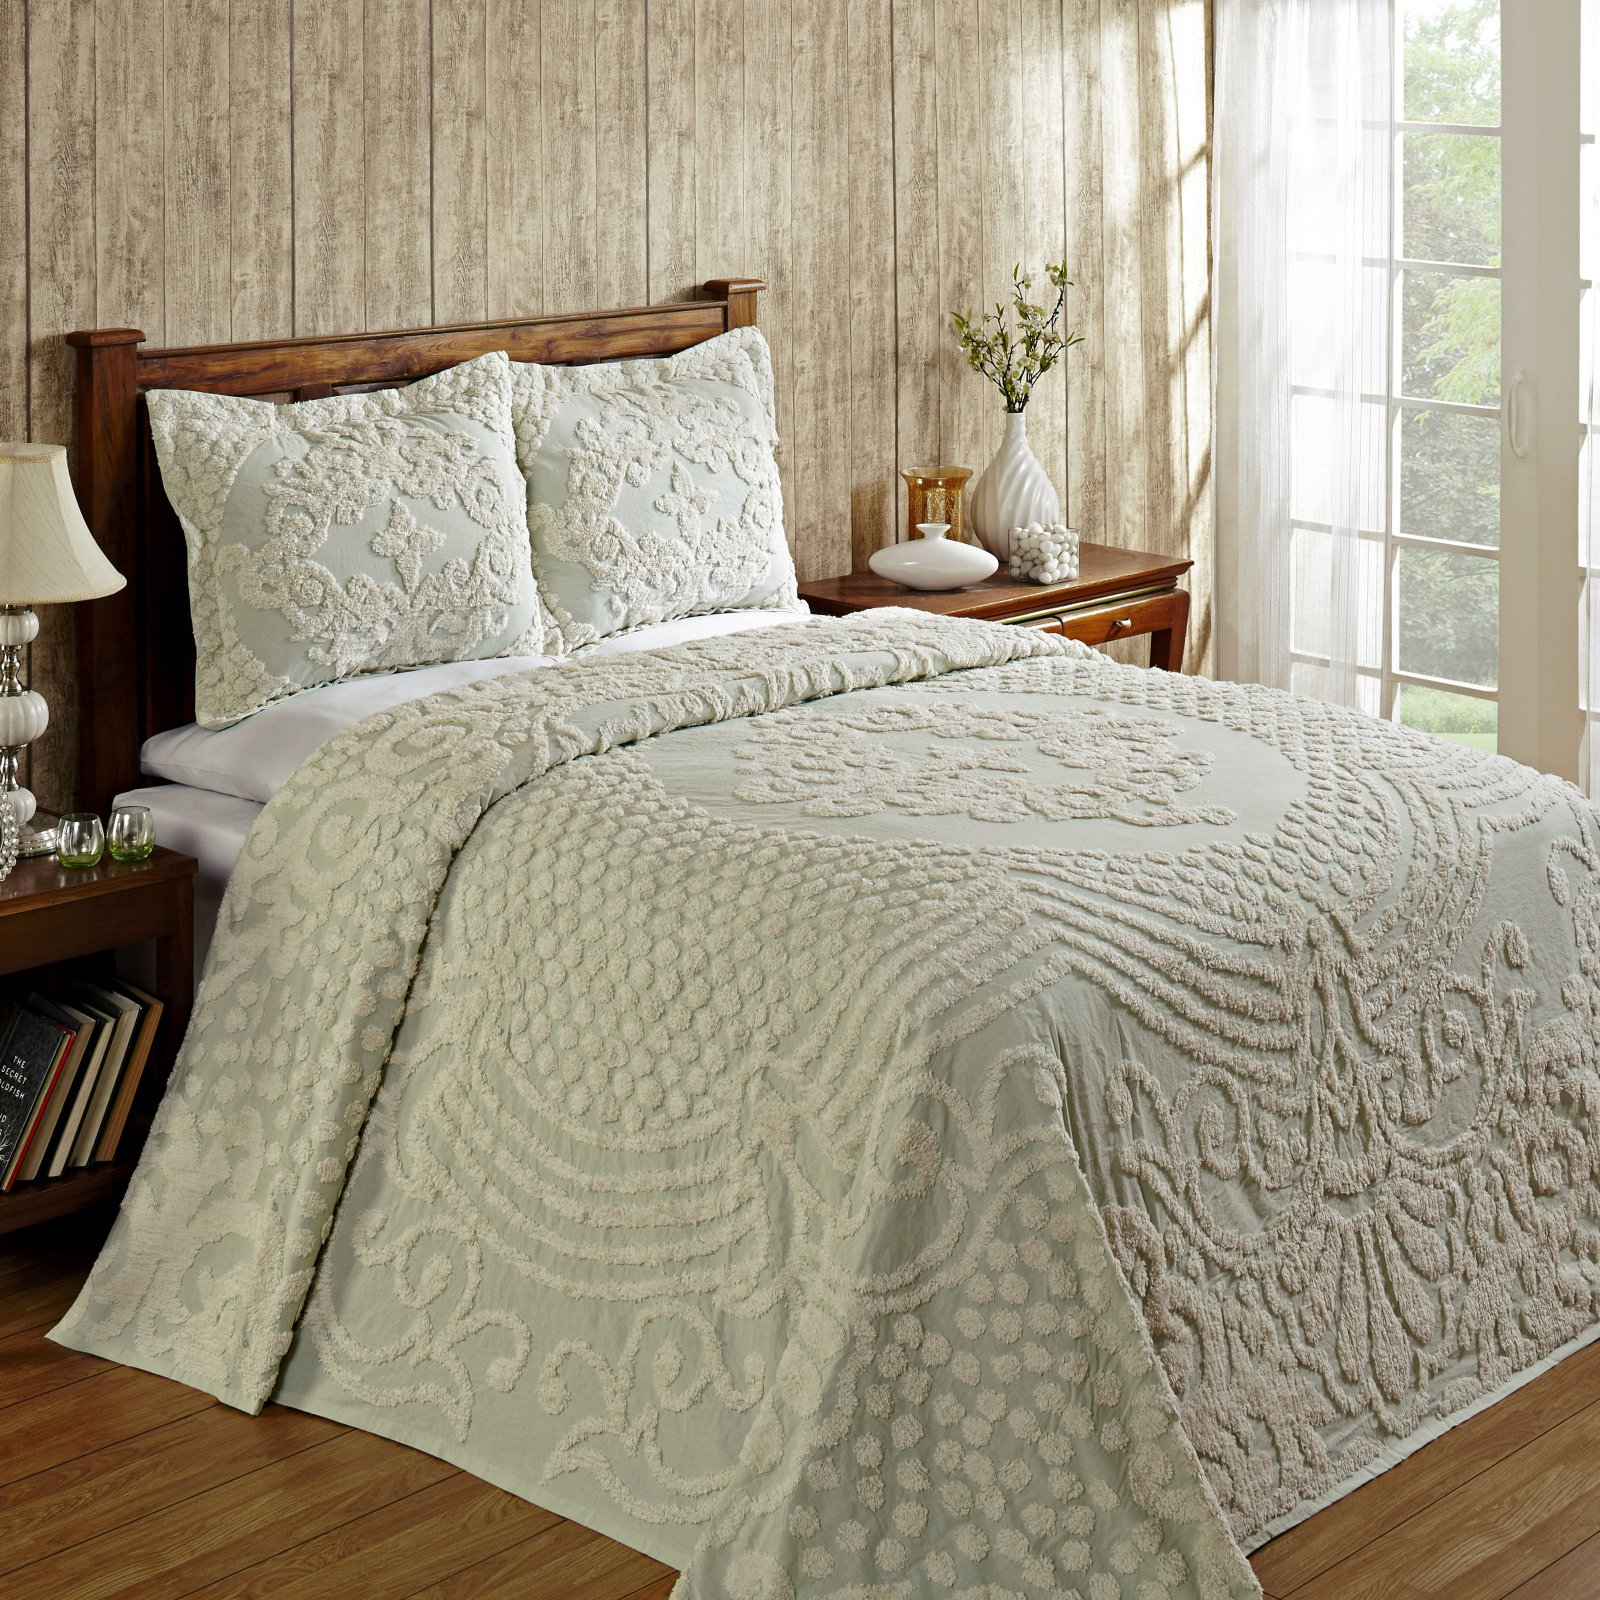 Florence Bedspread Twin 81X110 - Sage